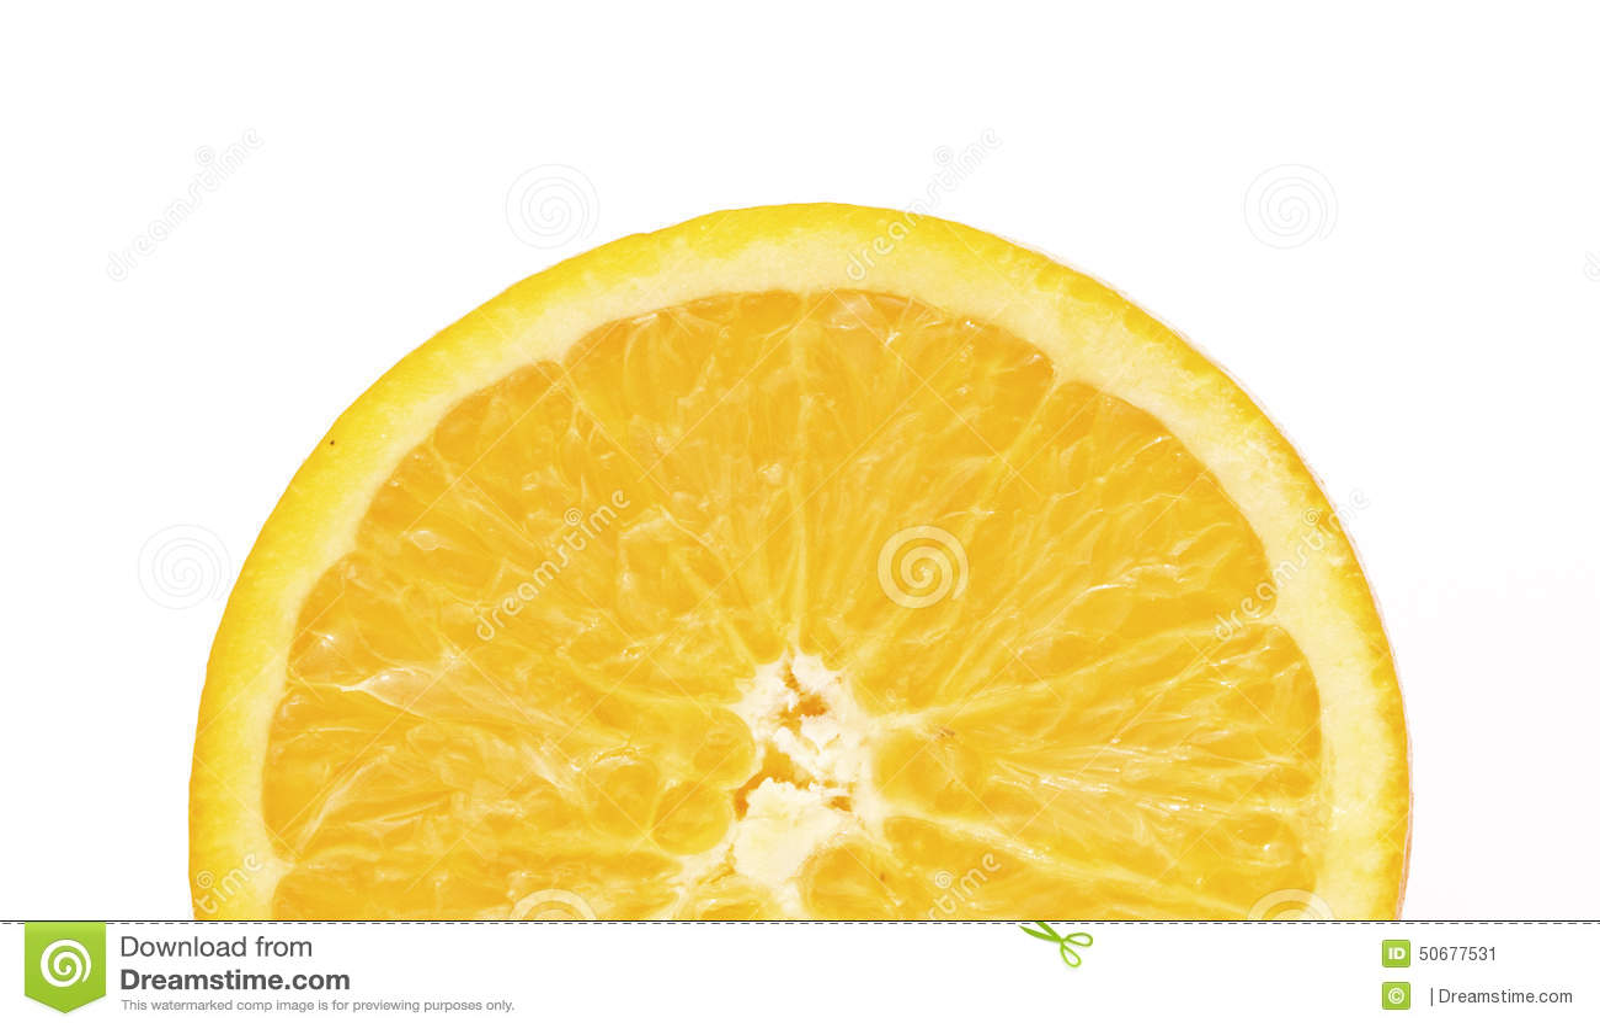 Download 背景查出的柠檬白色 库存图片. 图片 包括有 柠檬, 背包, 空白, 关闭, 维生素, 果子, 水多, 汁液 - 50677531